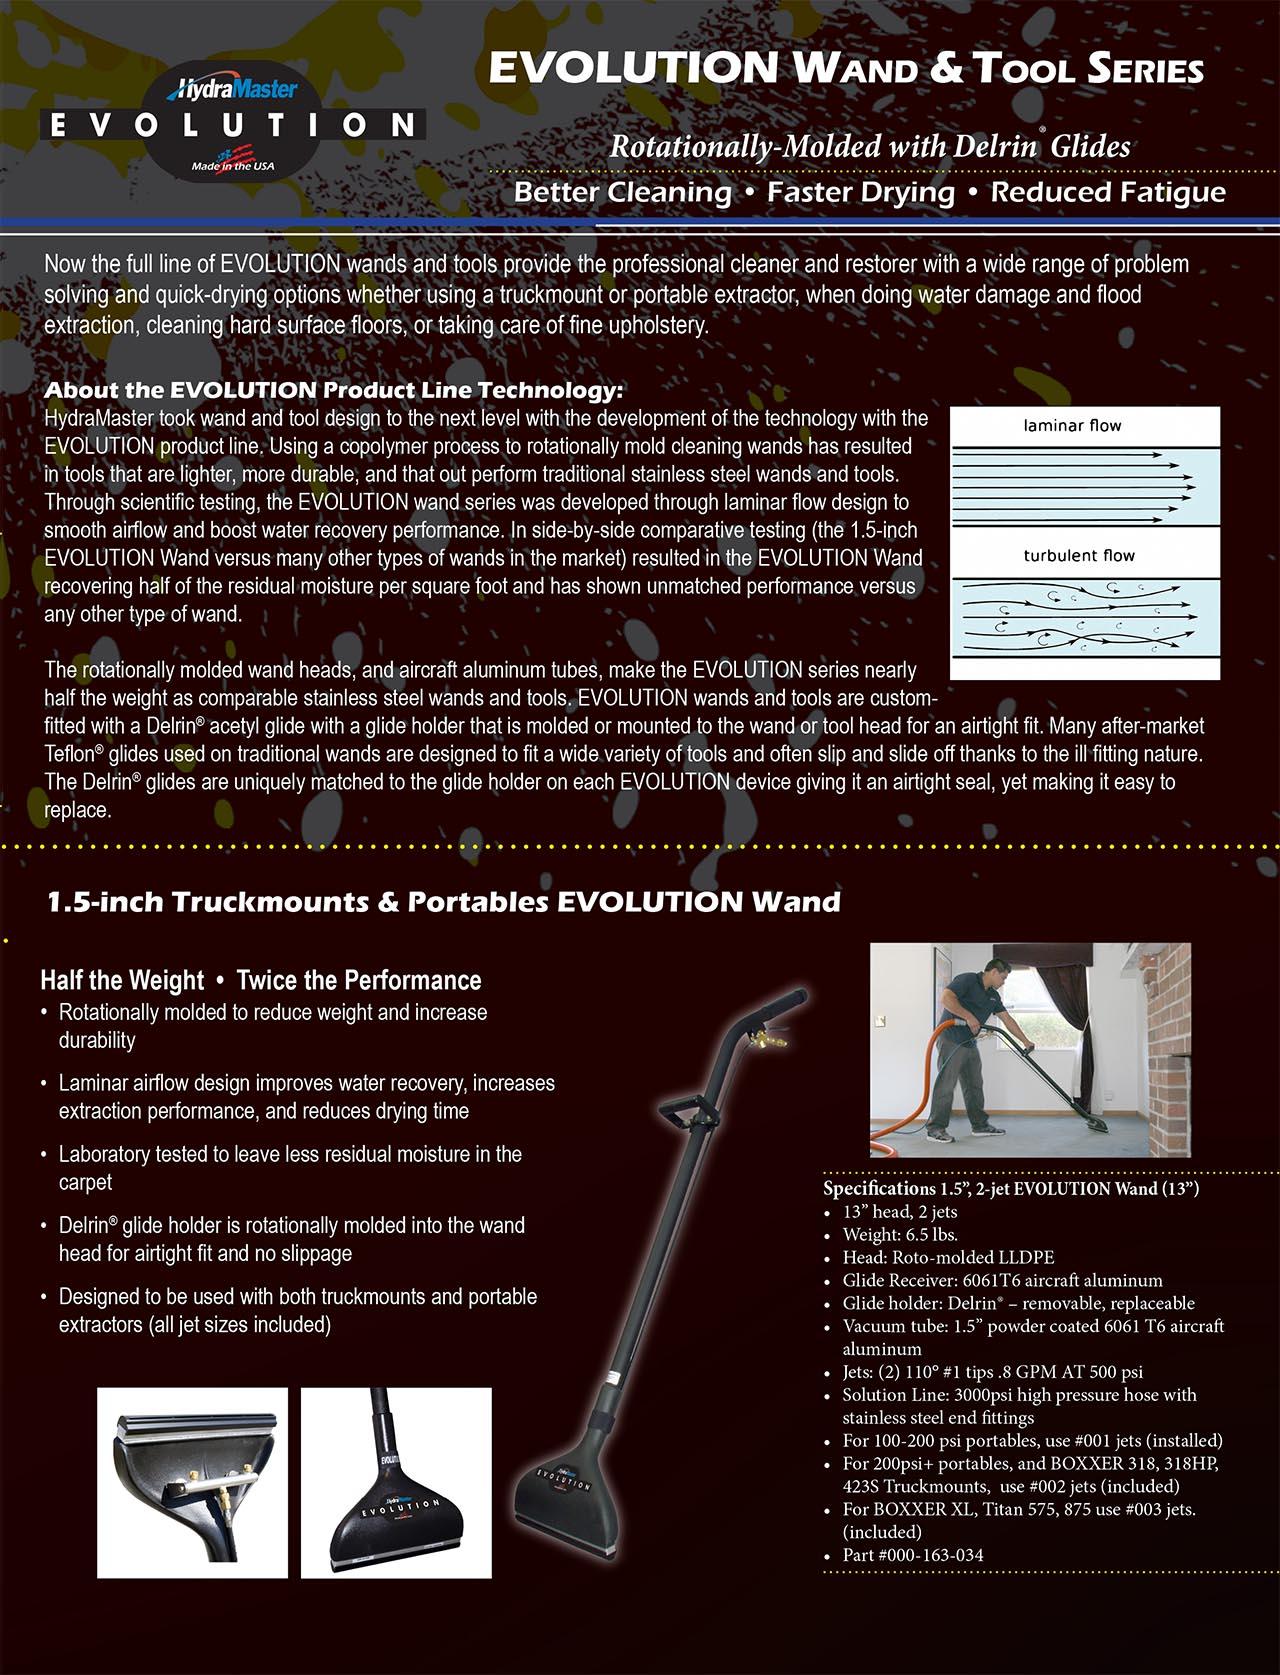 EVO_Product_Line_Brochure_single_sheets-1.jpg